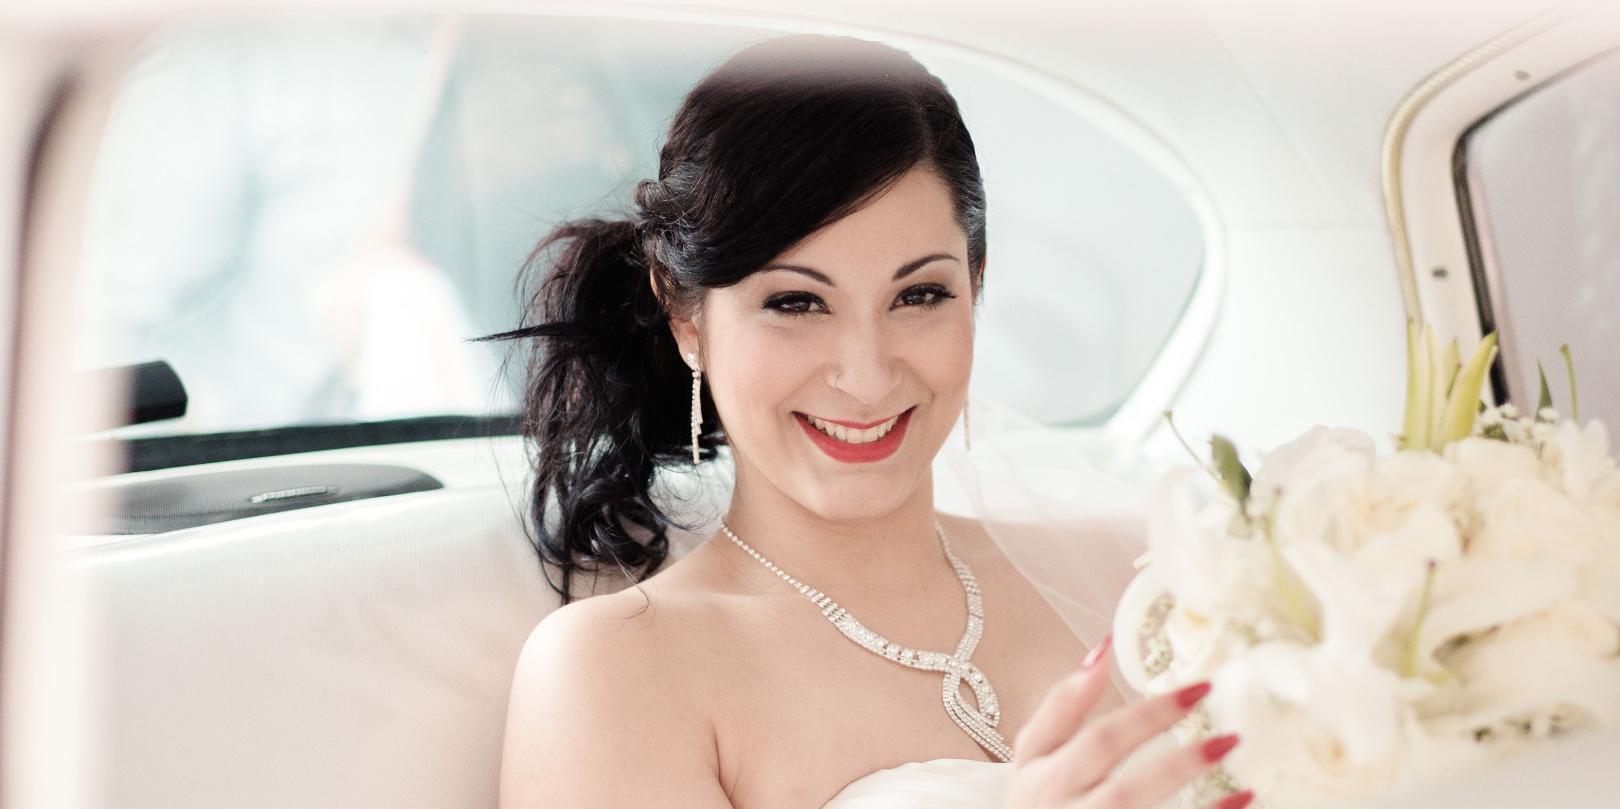 bodas-sin-clasificar-sin-tema-cuba-25791.jpg